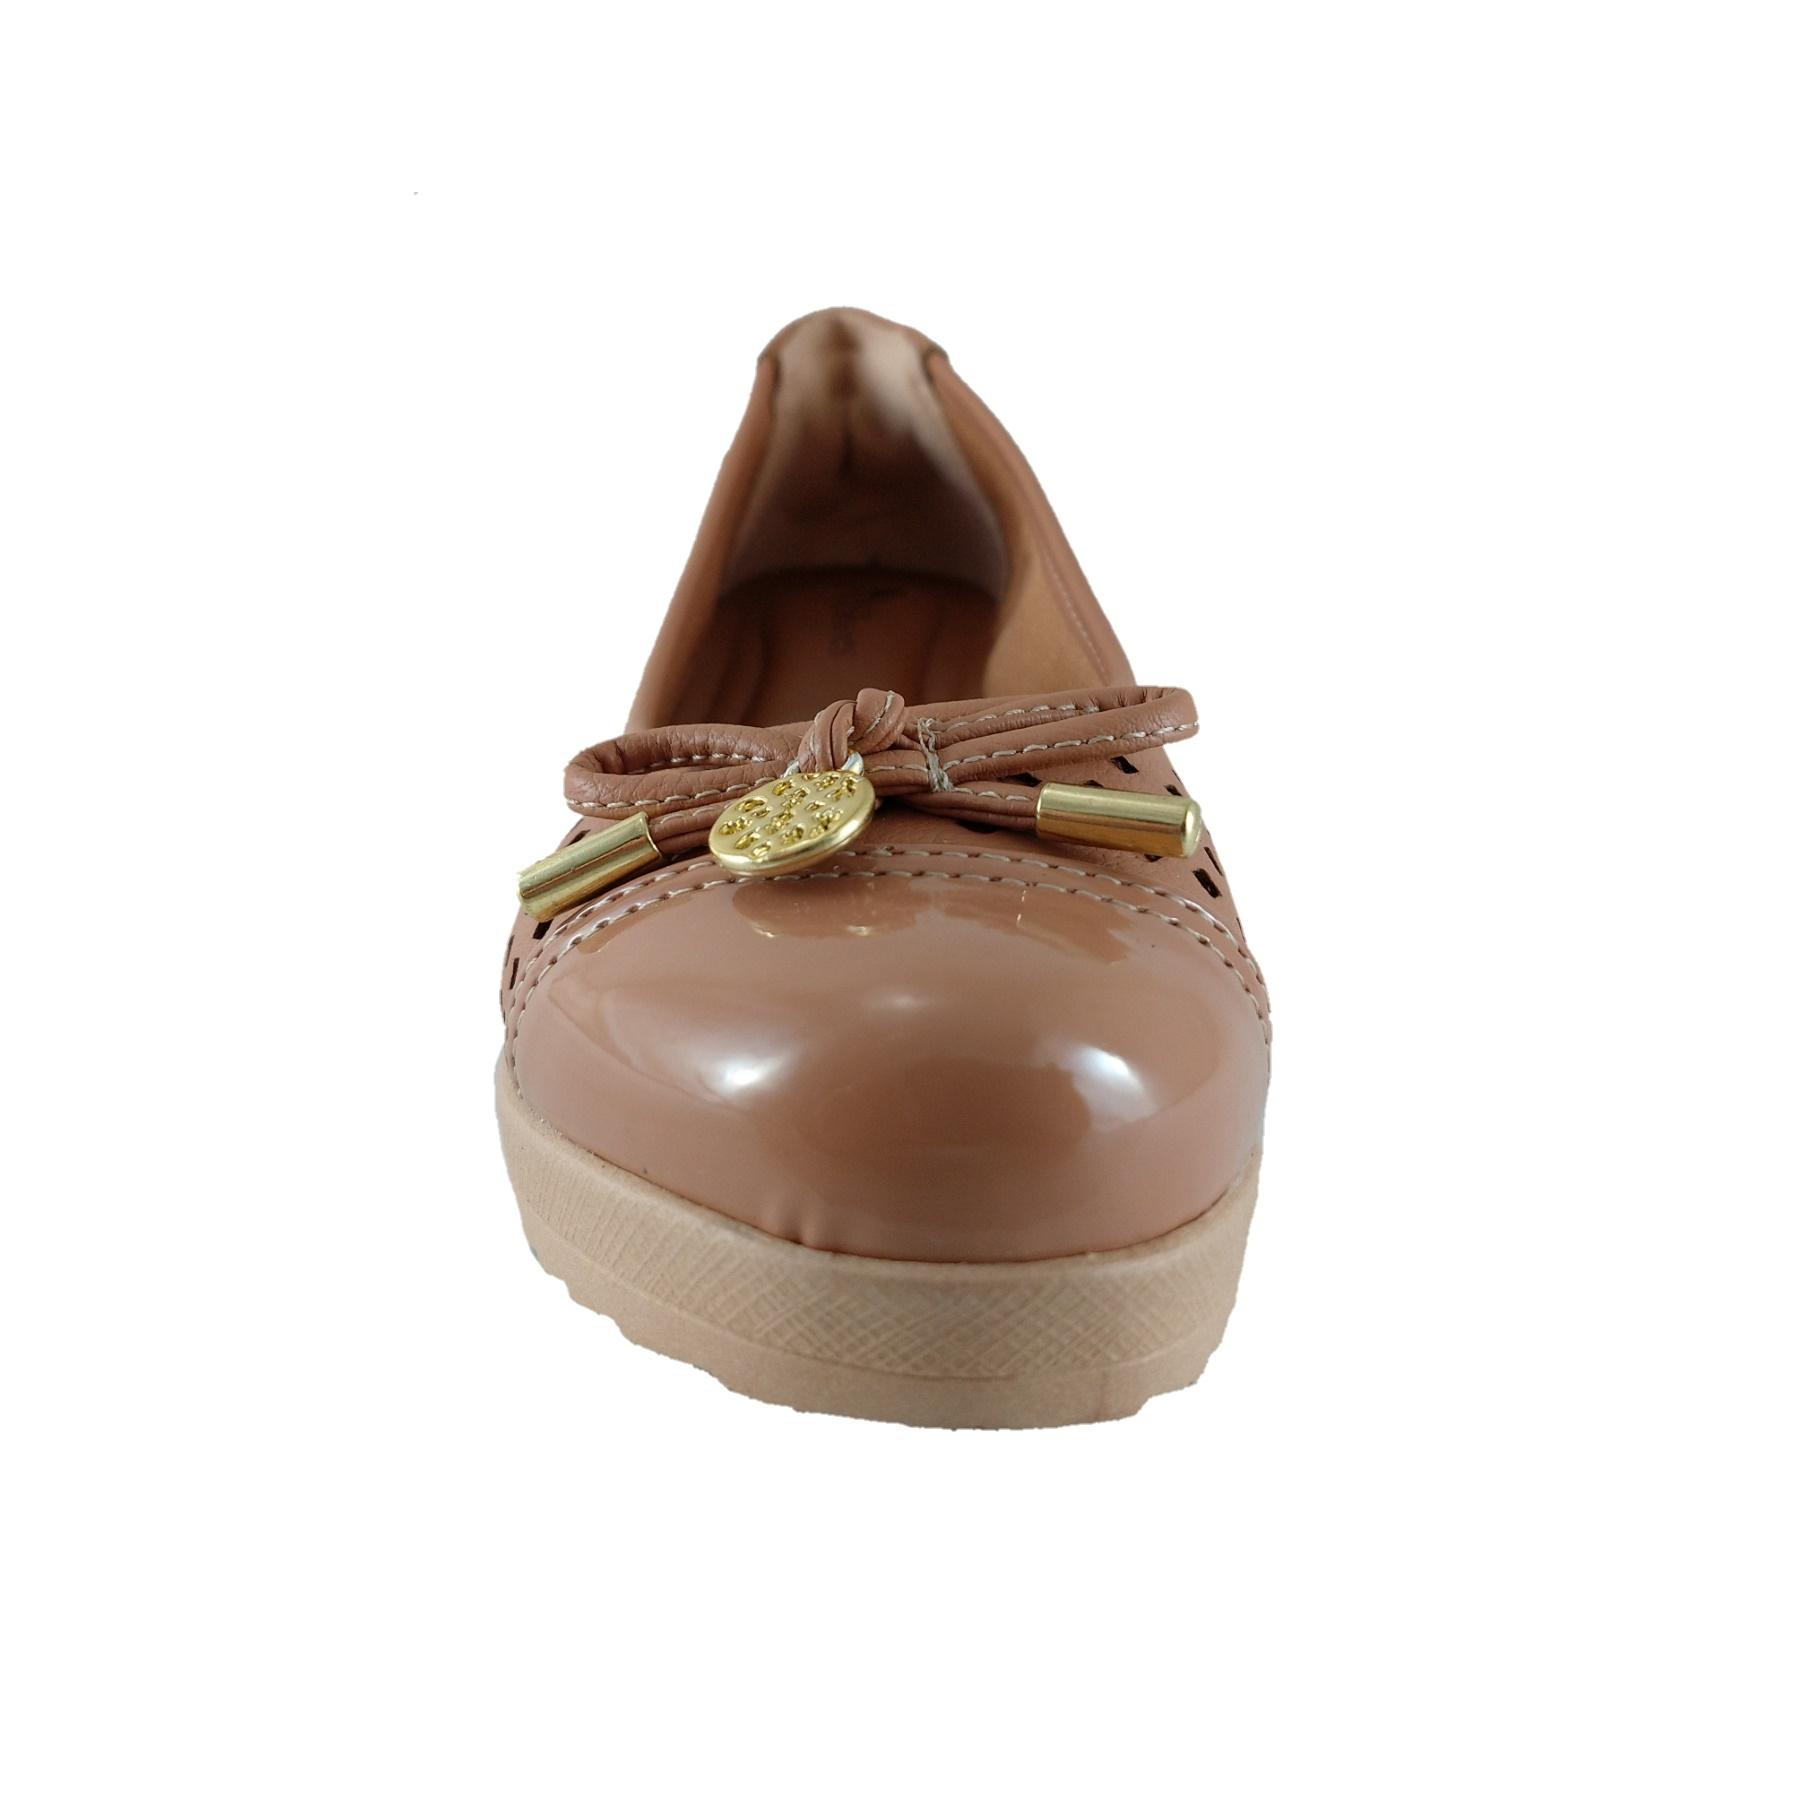 Sapato Anabela SapatoWeb Confort Marrom  - SAPATOWEB.COM